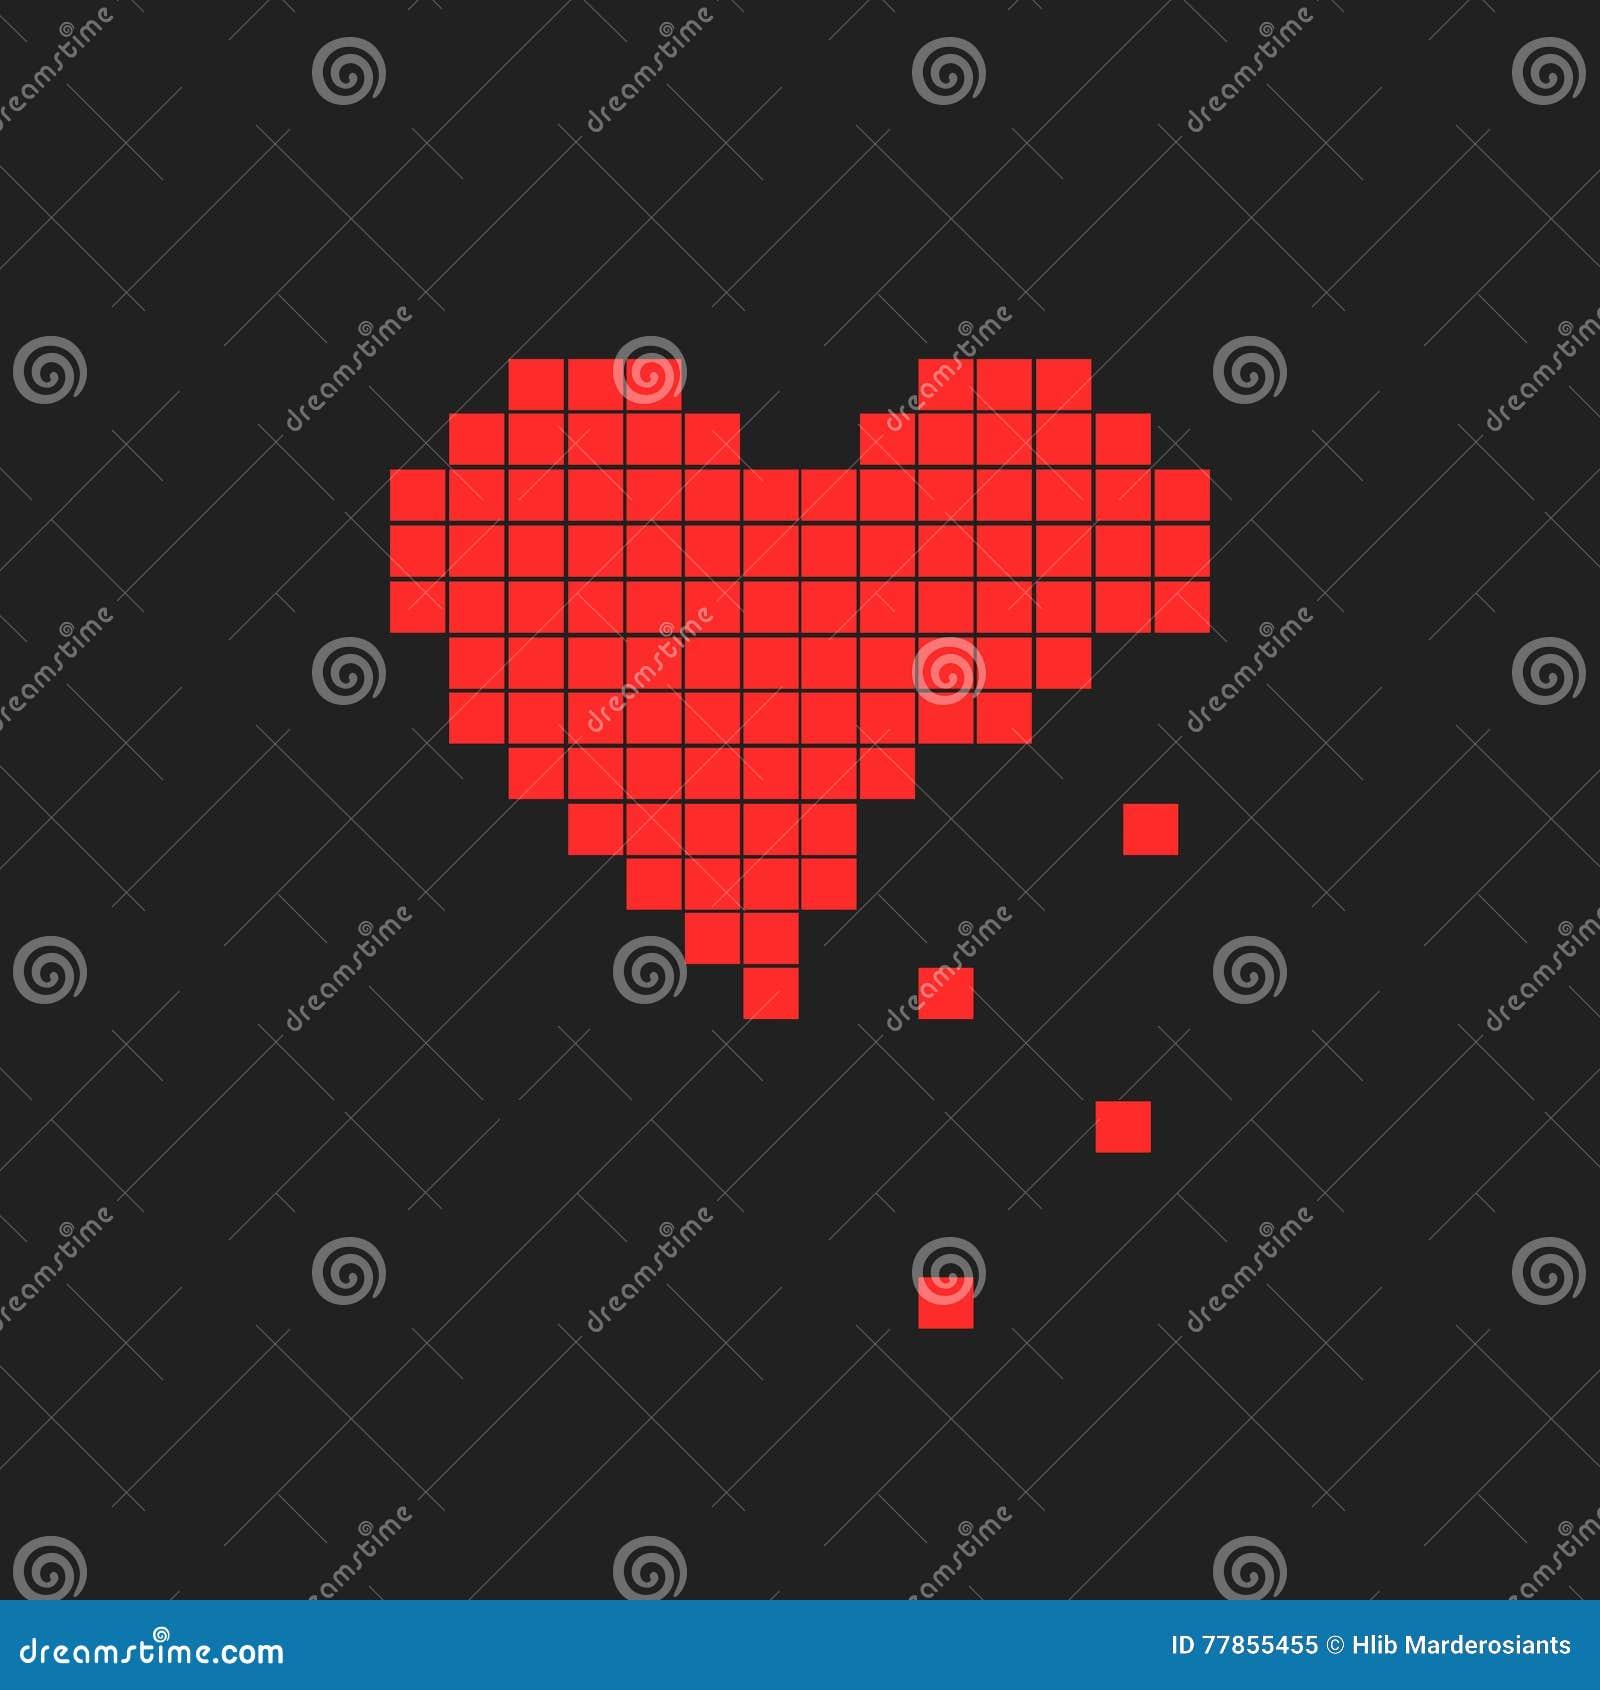 Illustration Of Heart Symbol In Pixel Art Style Stock Illustration